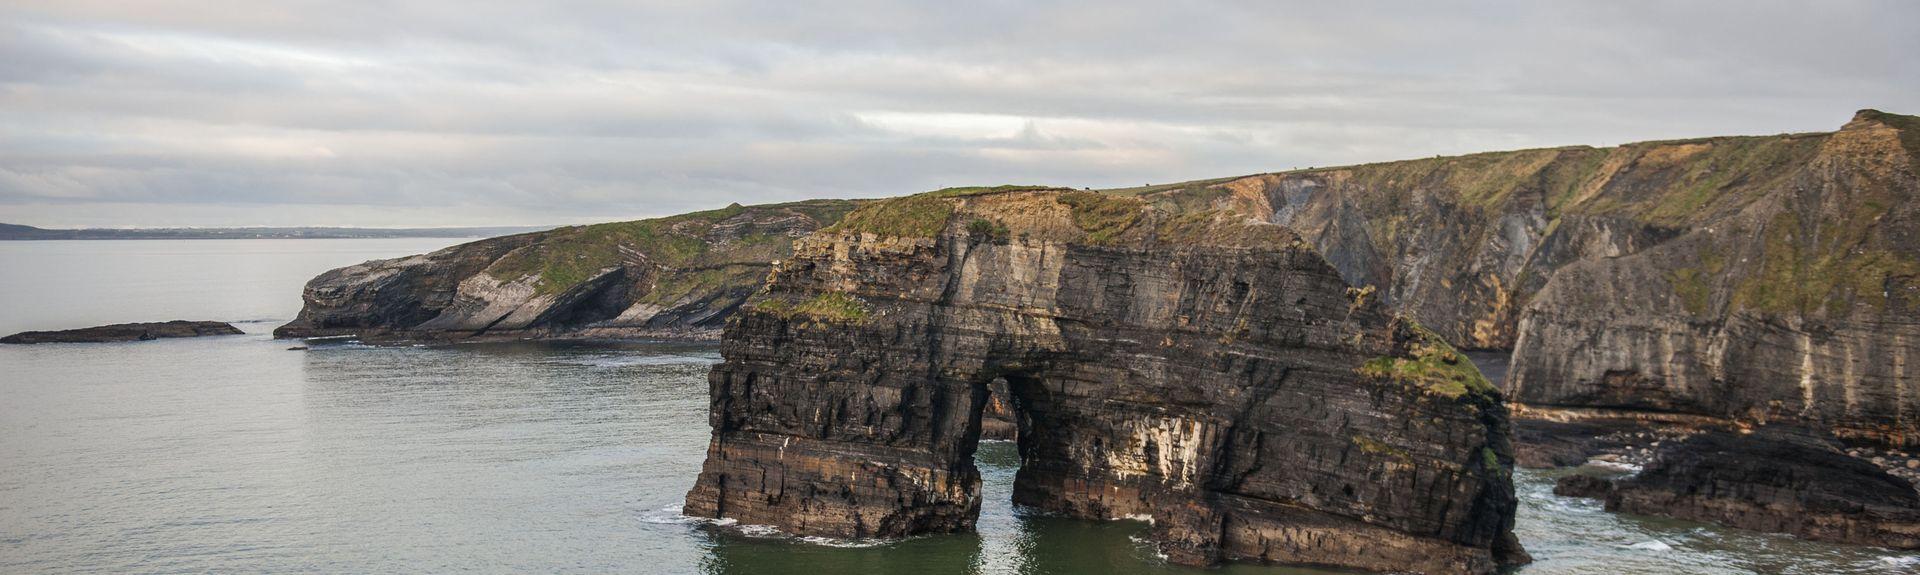 Killorglin Golf Club, Milltown, County Kerry, Ireland